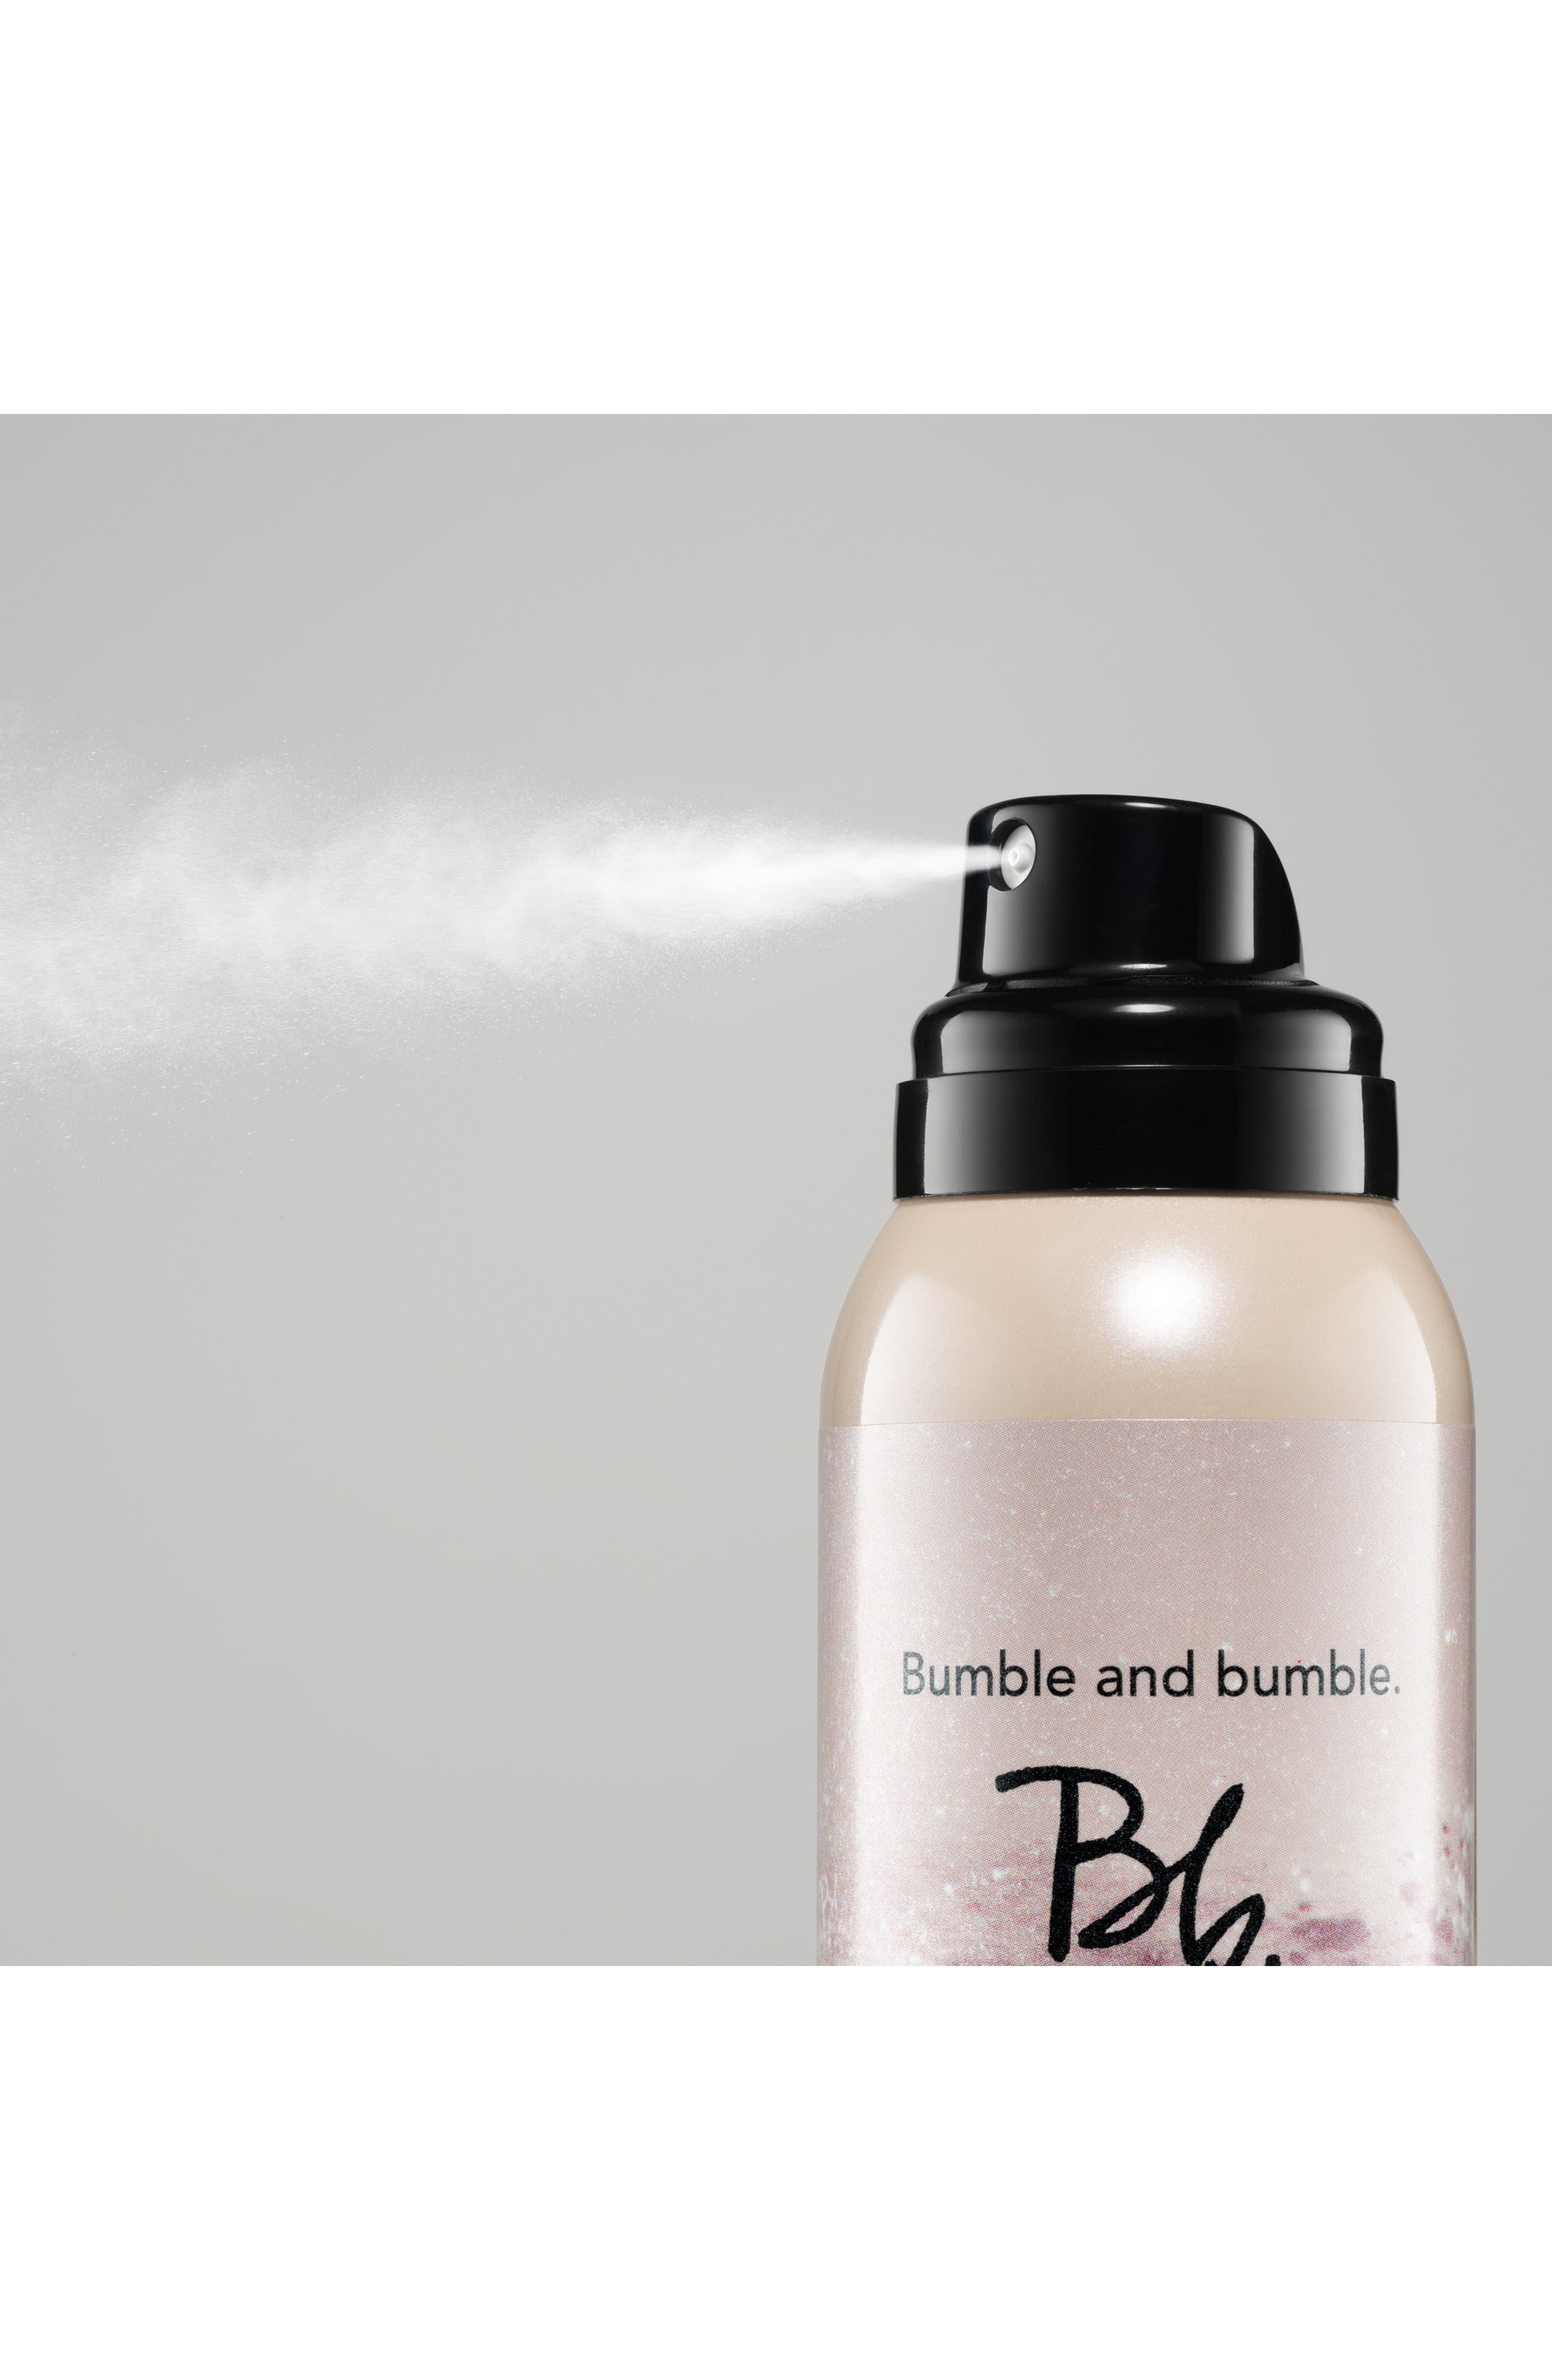 BUMBLE AND BUMBLE,                             Prêt-a-Powder Très Invisible Nourishing Dry Shampoo,                             Alternate thumbnail 3, color,                             NO COLOR